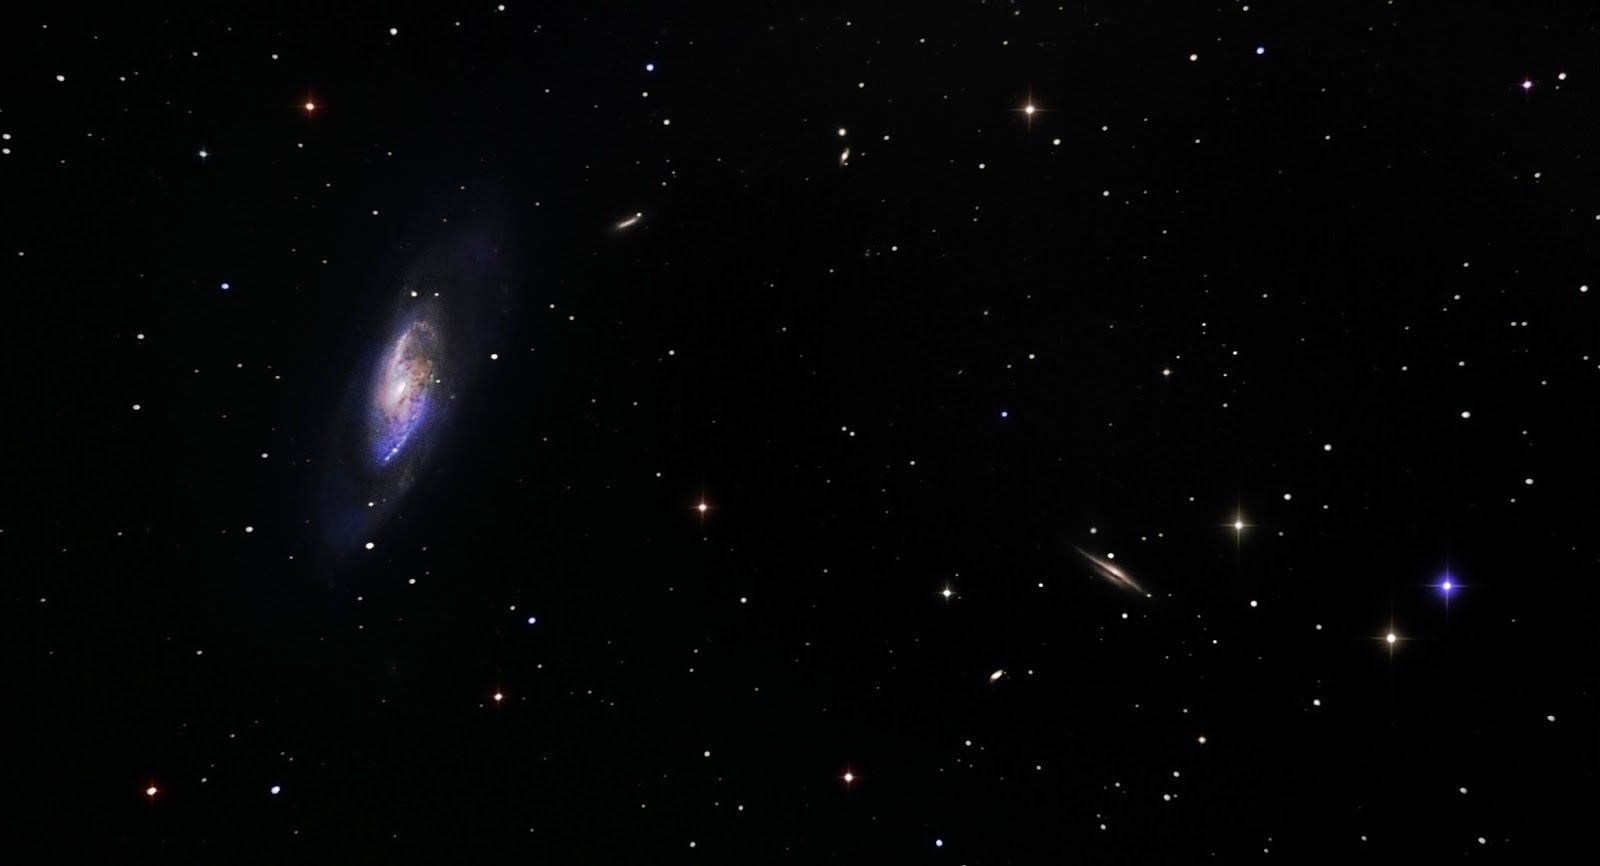 M106+Final+Image+2014.jpg